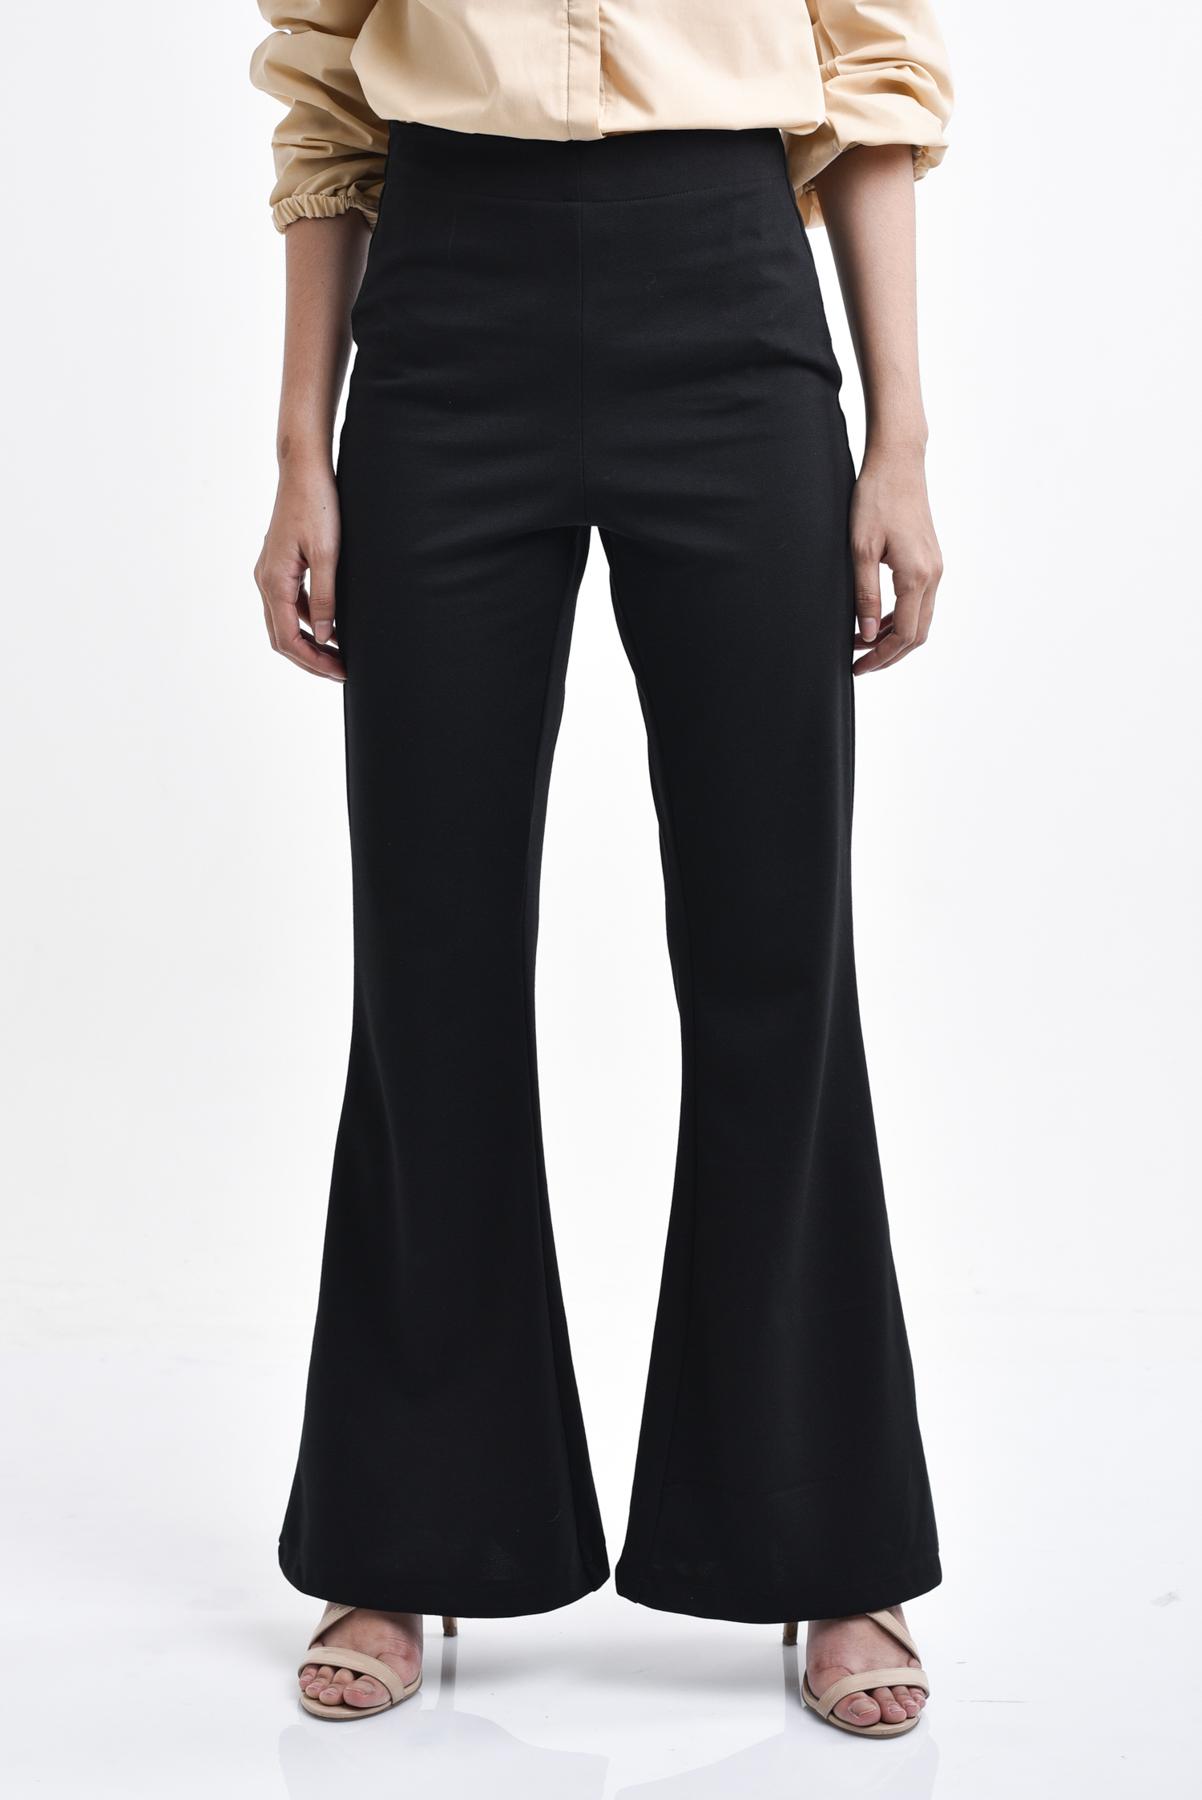 Lestari Pants in Black